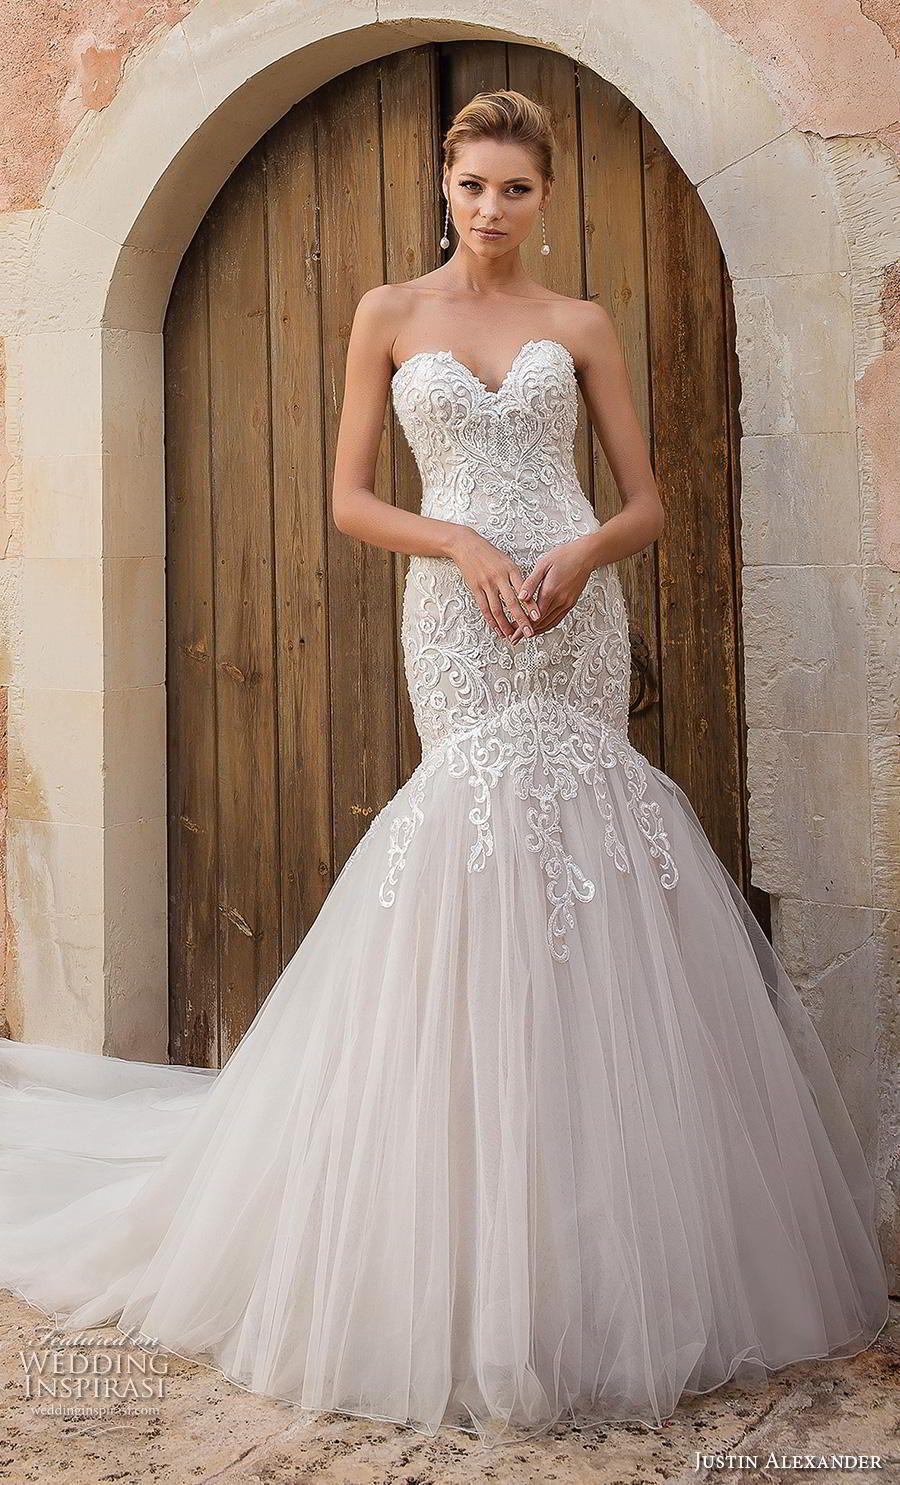 Justin Alexander Spring 2019 Wedding Dresses Wedding Inspirasi Justin Alexander Wedding Dress Justin Alexander Bridal Backless Mermaid Wedding Dresses [ 1485 x 900 Pixel ]